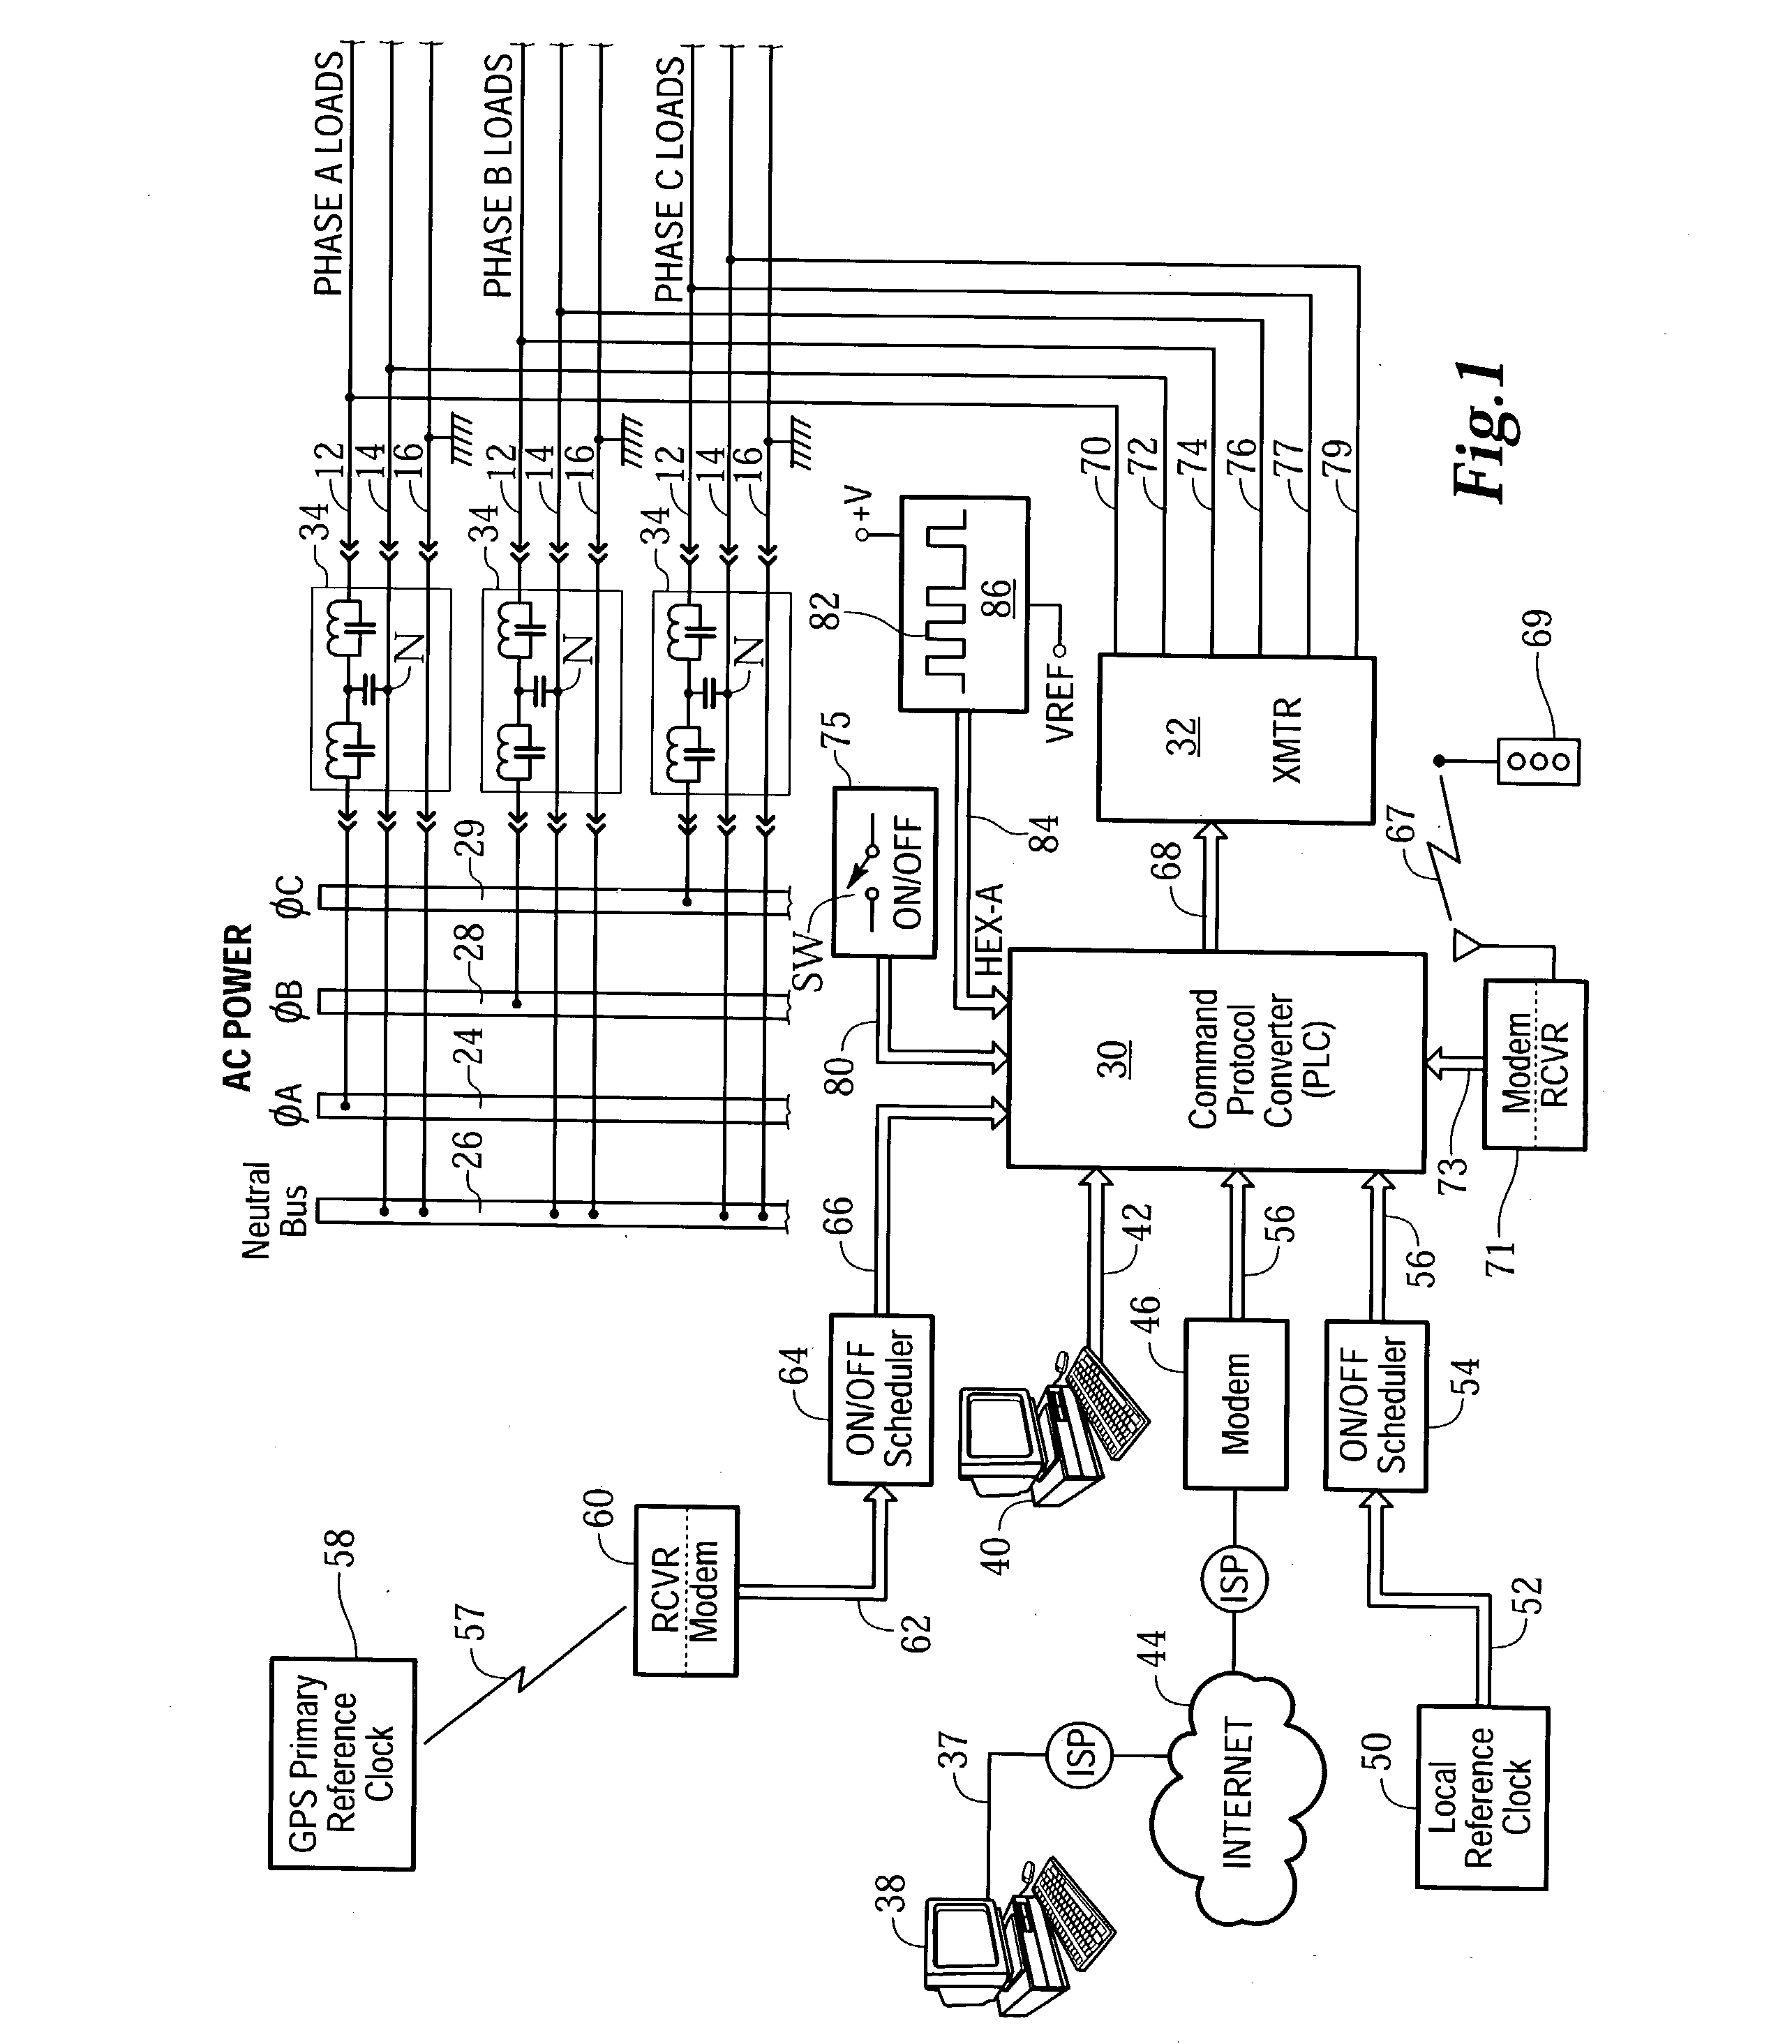 Iq option cheat engine